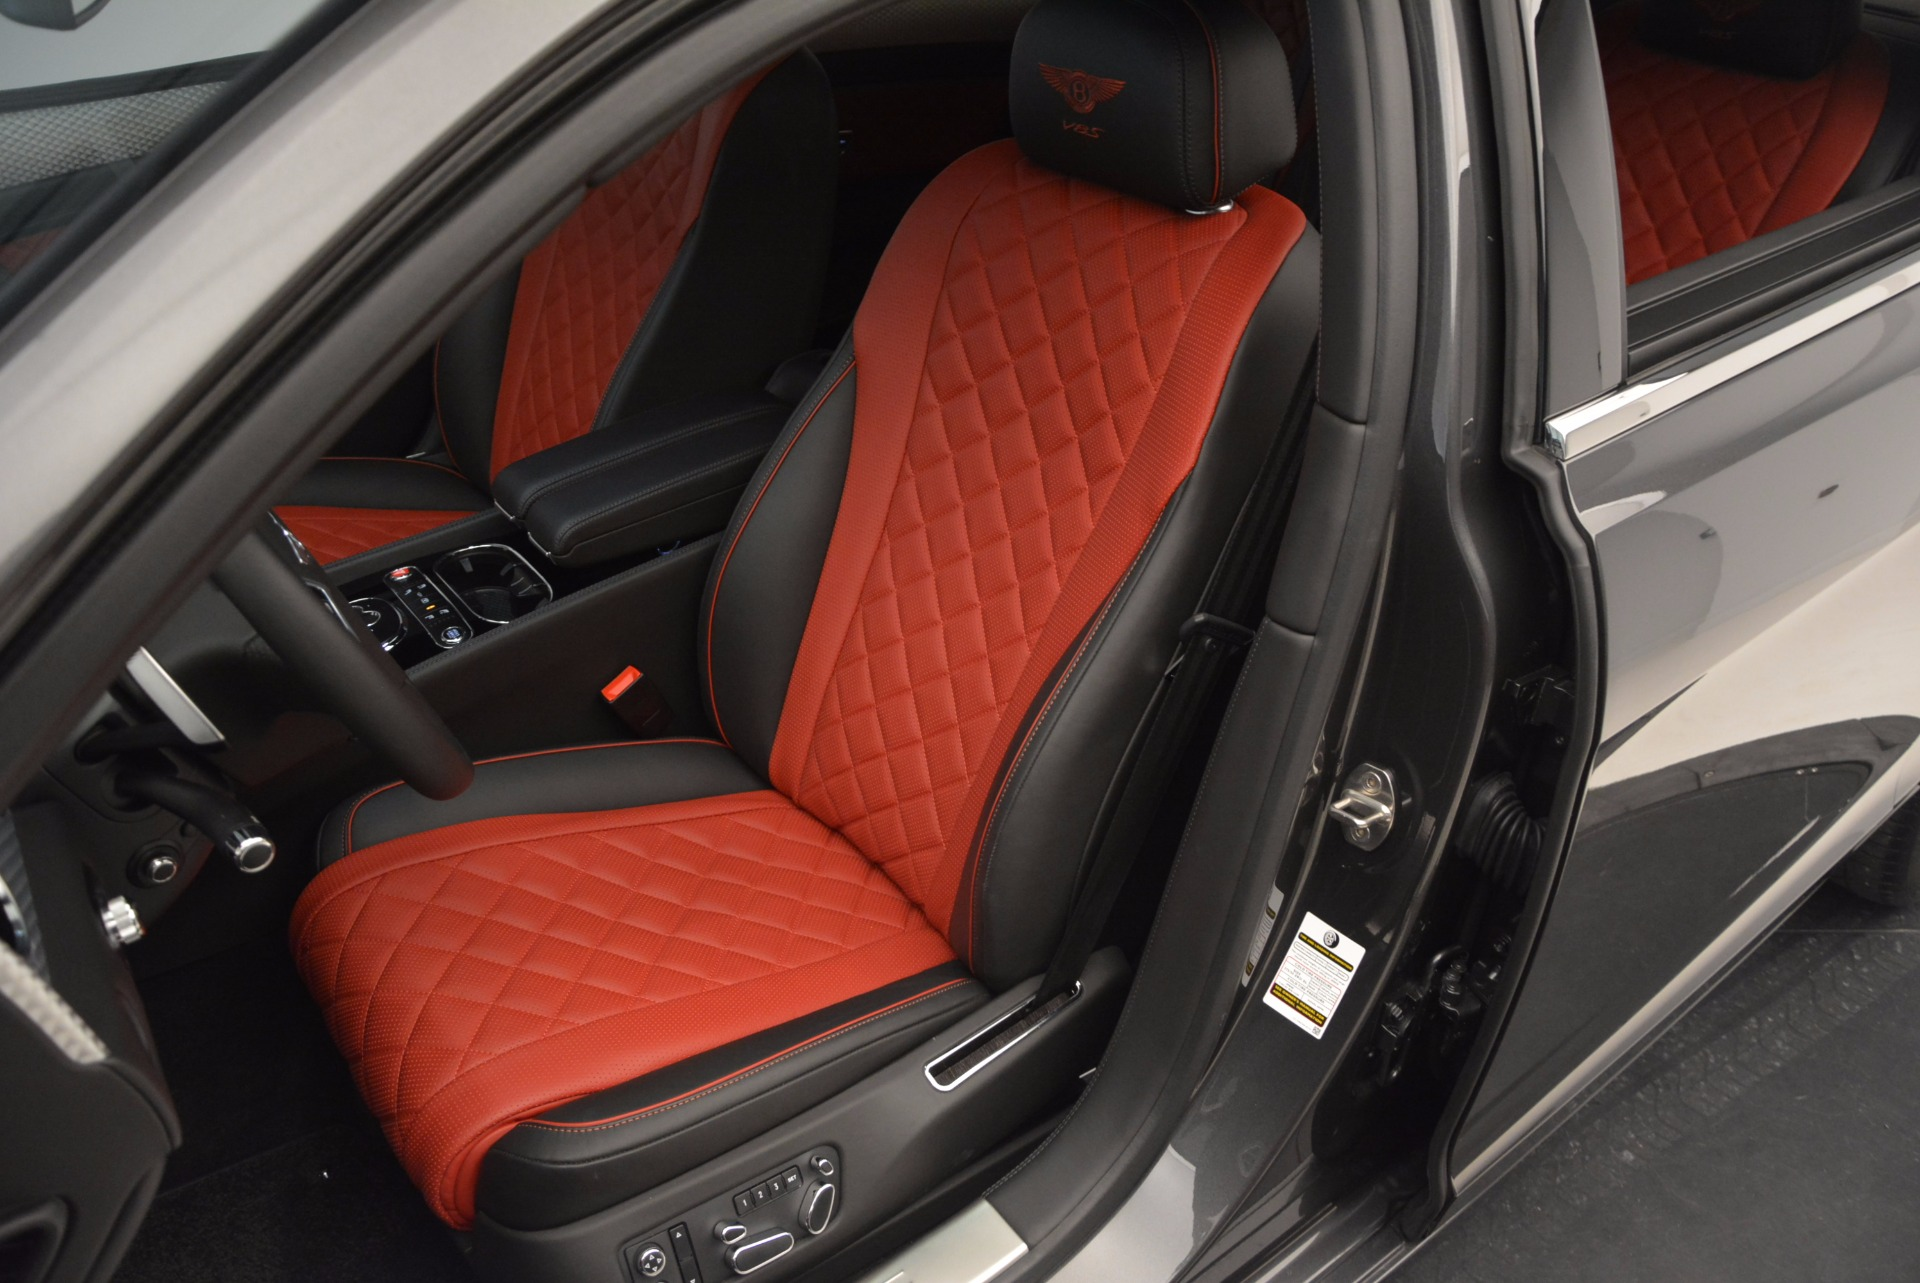 Used 2017 Bentley Flying Spur V8 S For Sale In Westport, CT 875_p24